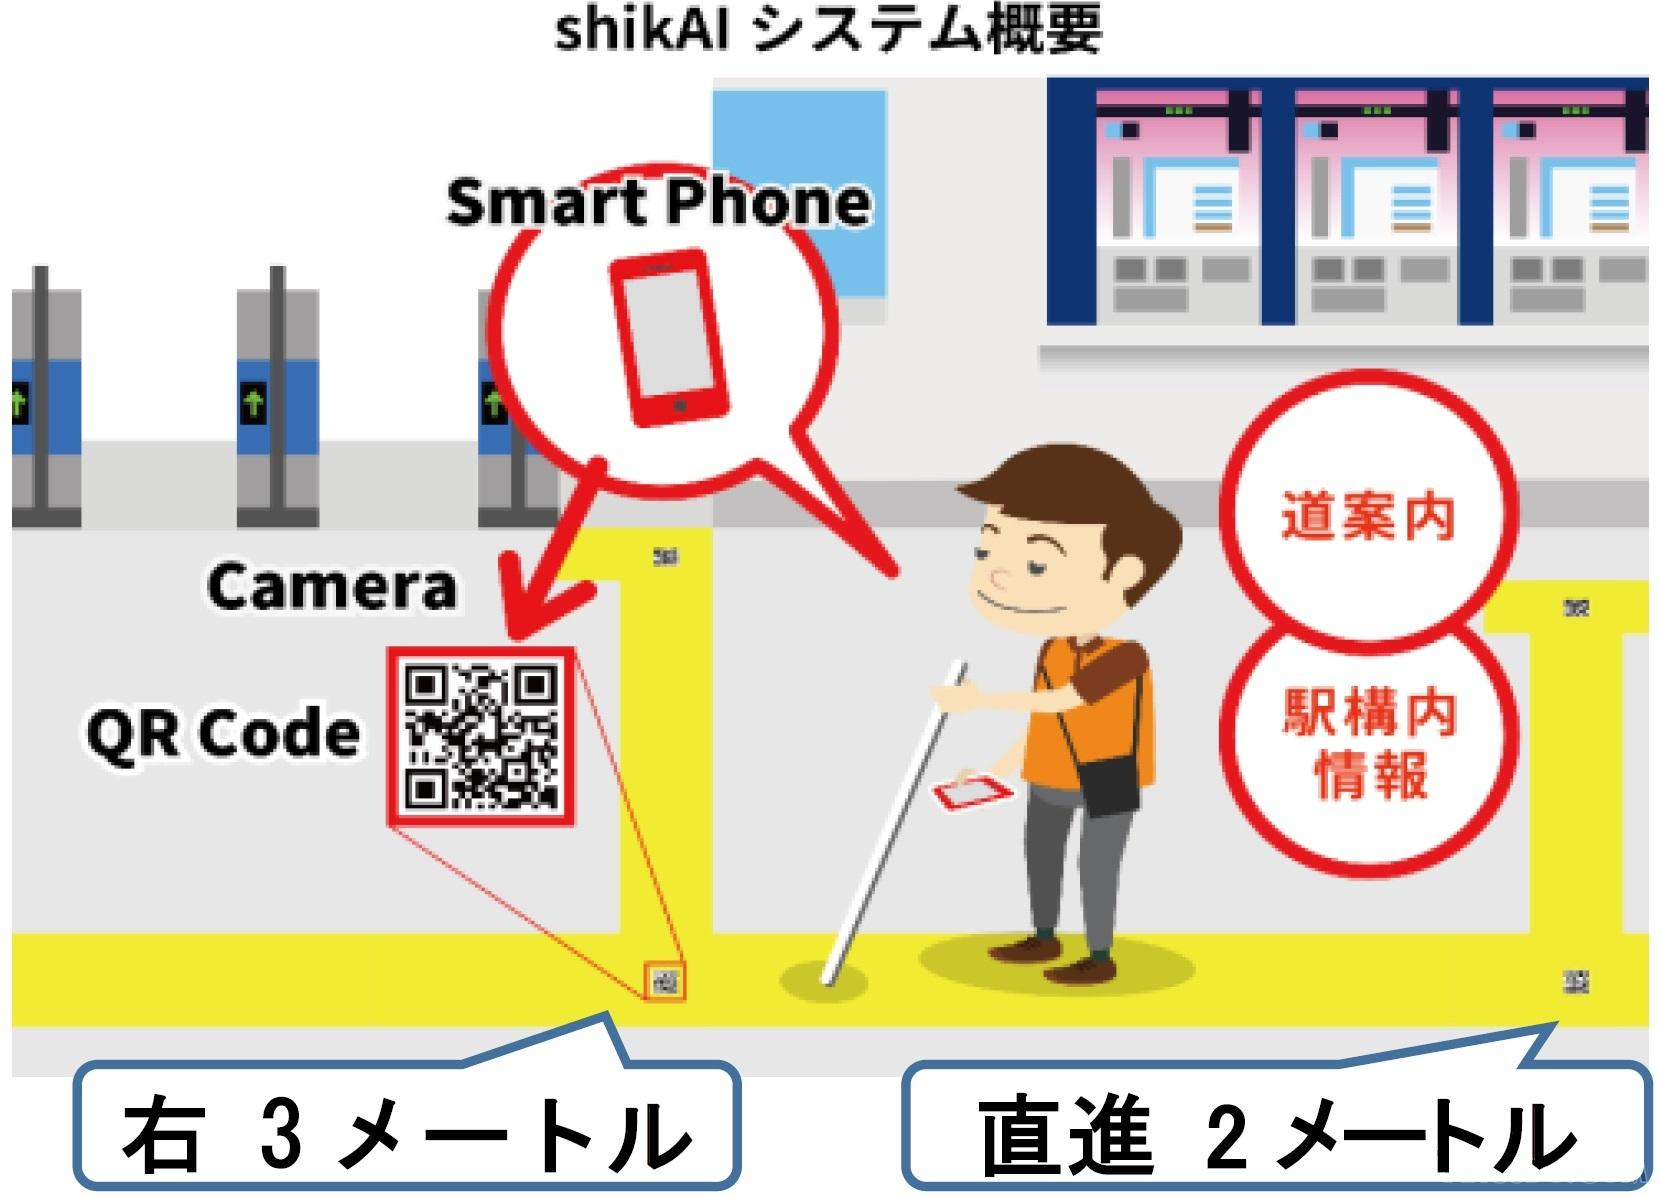 shikAIのシステム概要(東京メトロ提供)